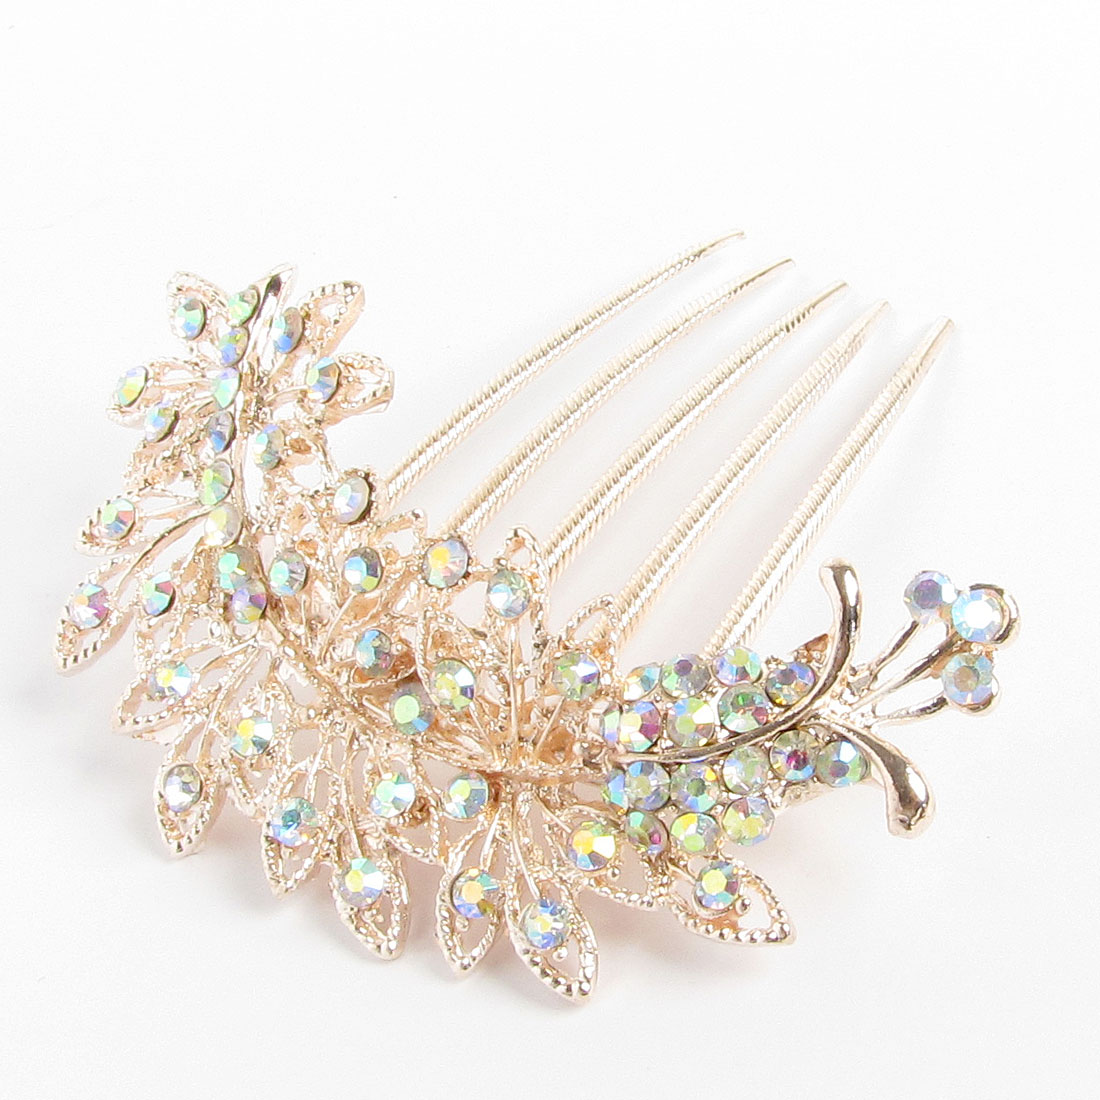 Glittery Faux Rhinestone Inlaid Flower Deocr Metal Hair Comb Clip Copper Tone